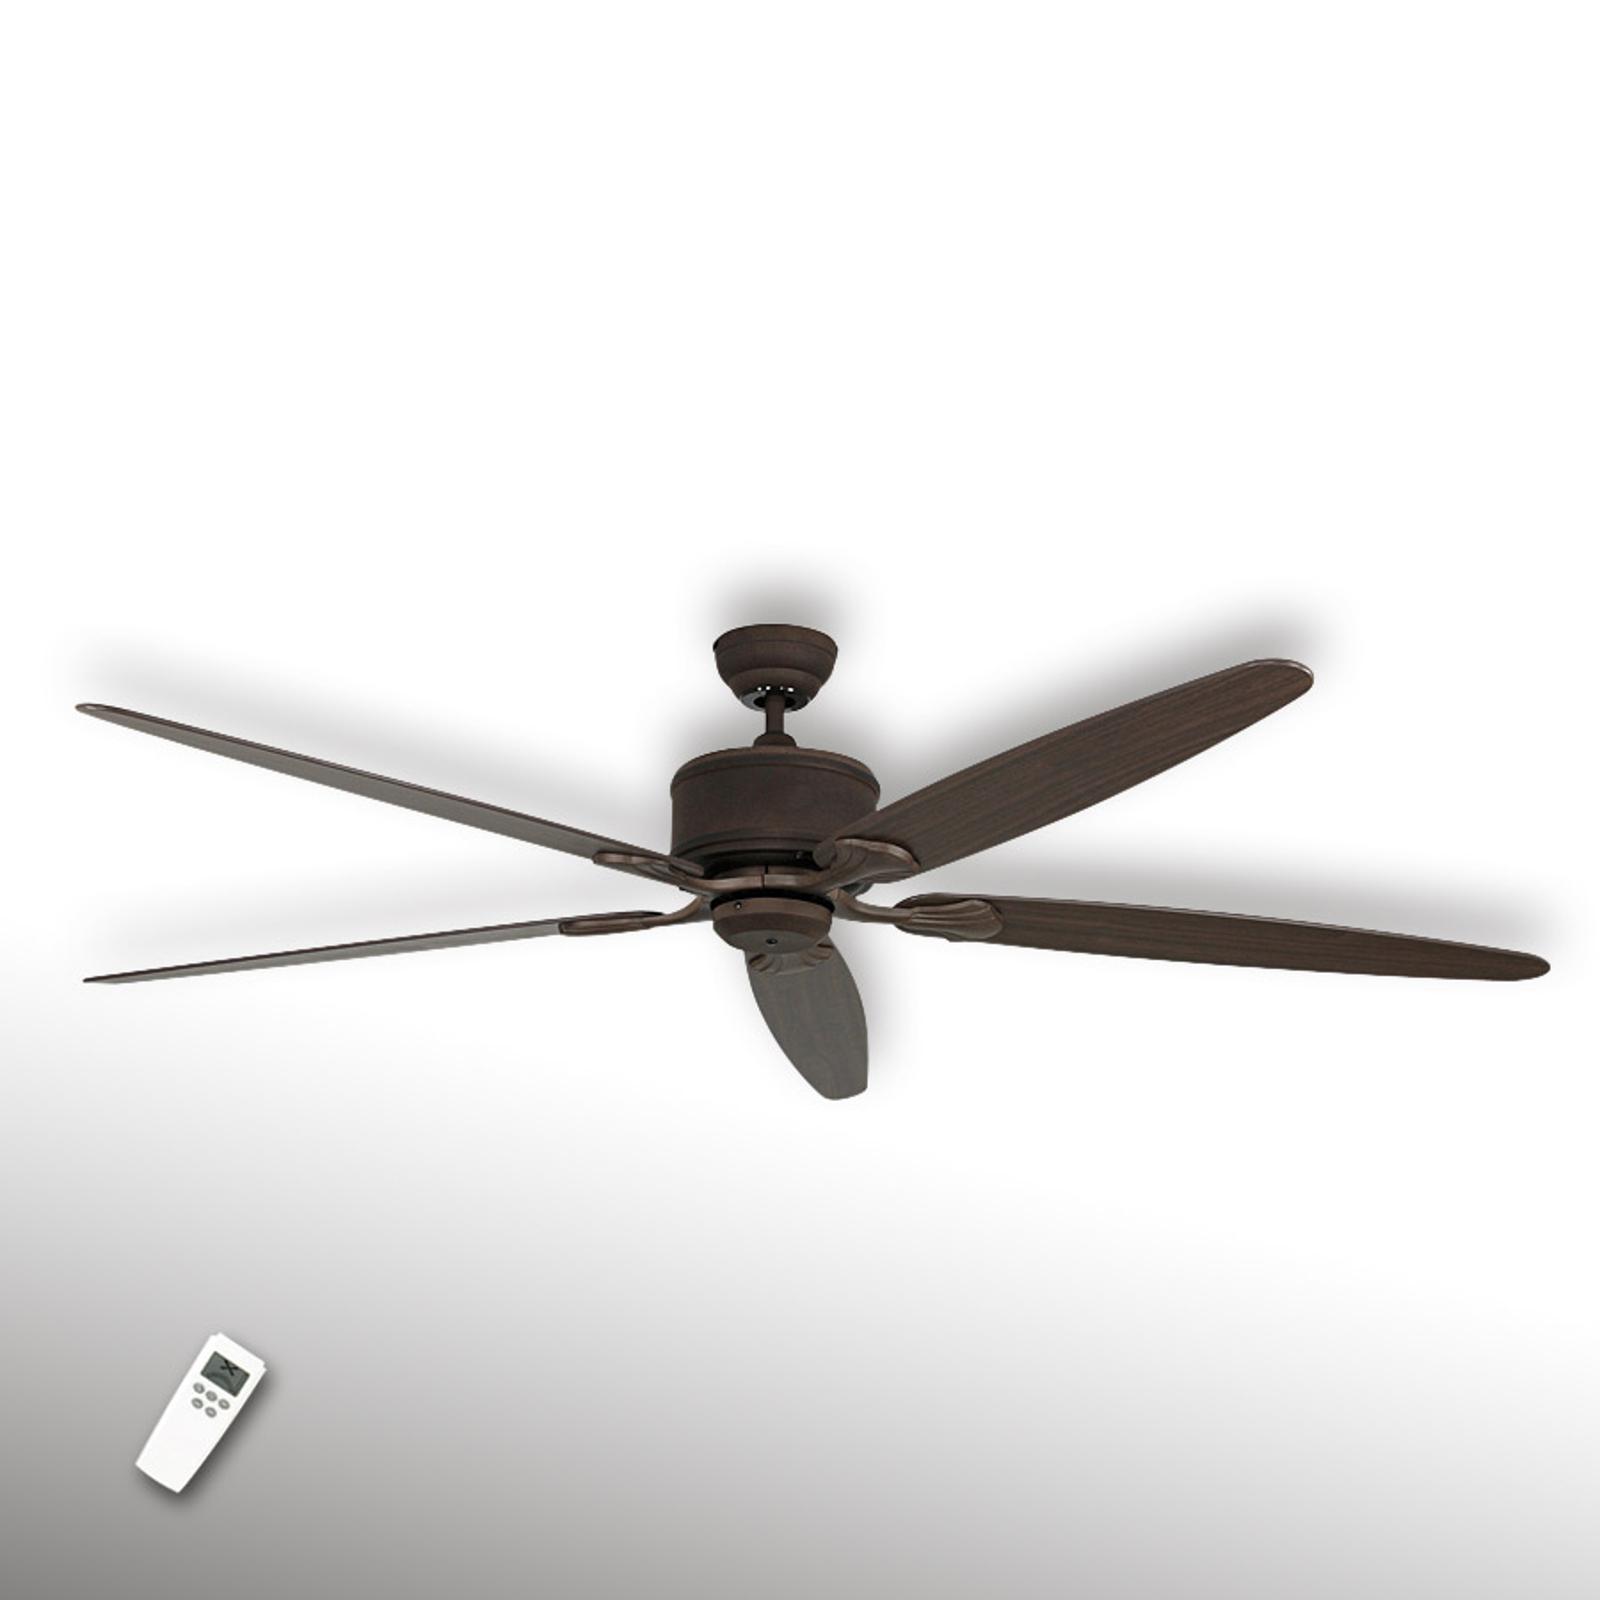 Stropný ventilátor Eco Elements hnedý 5-lopatkový